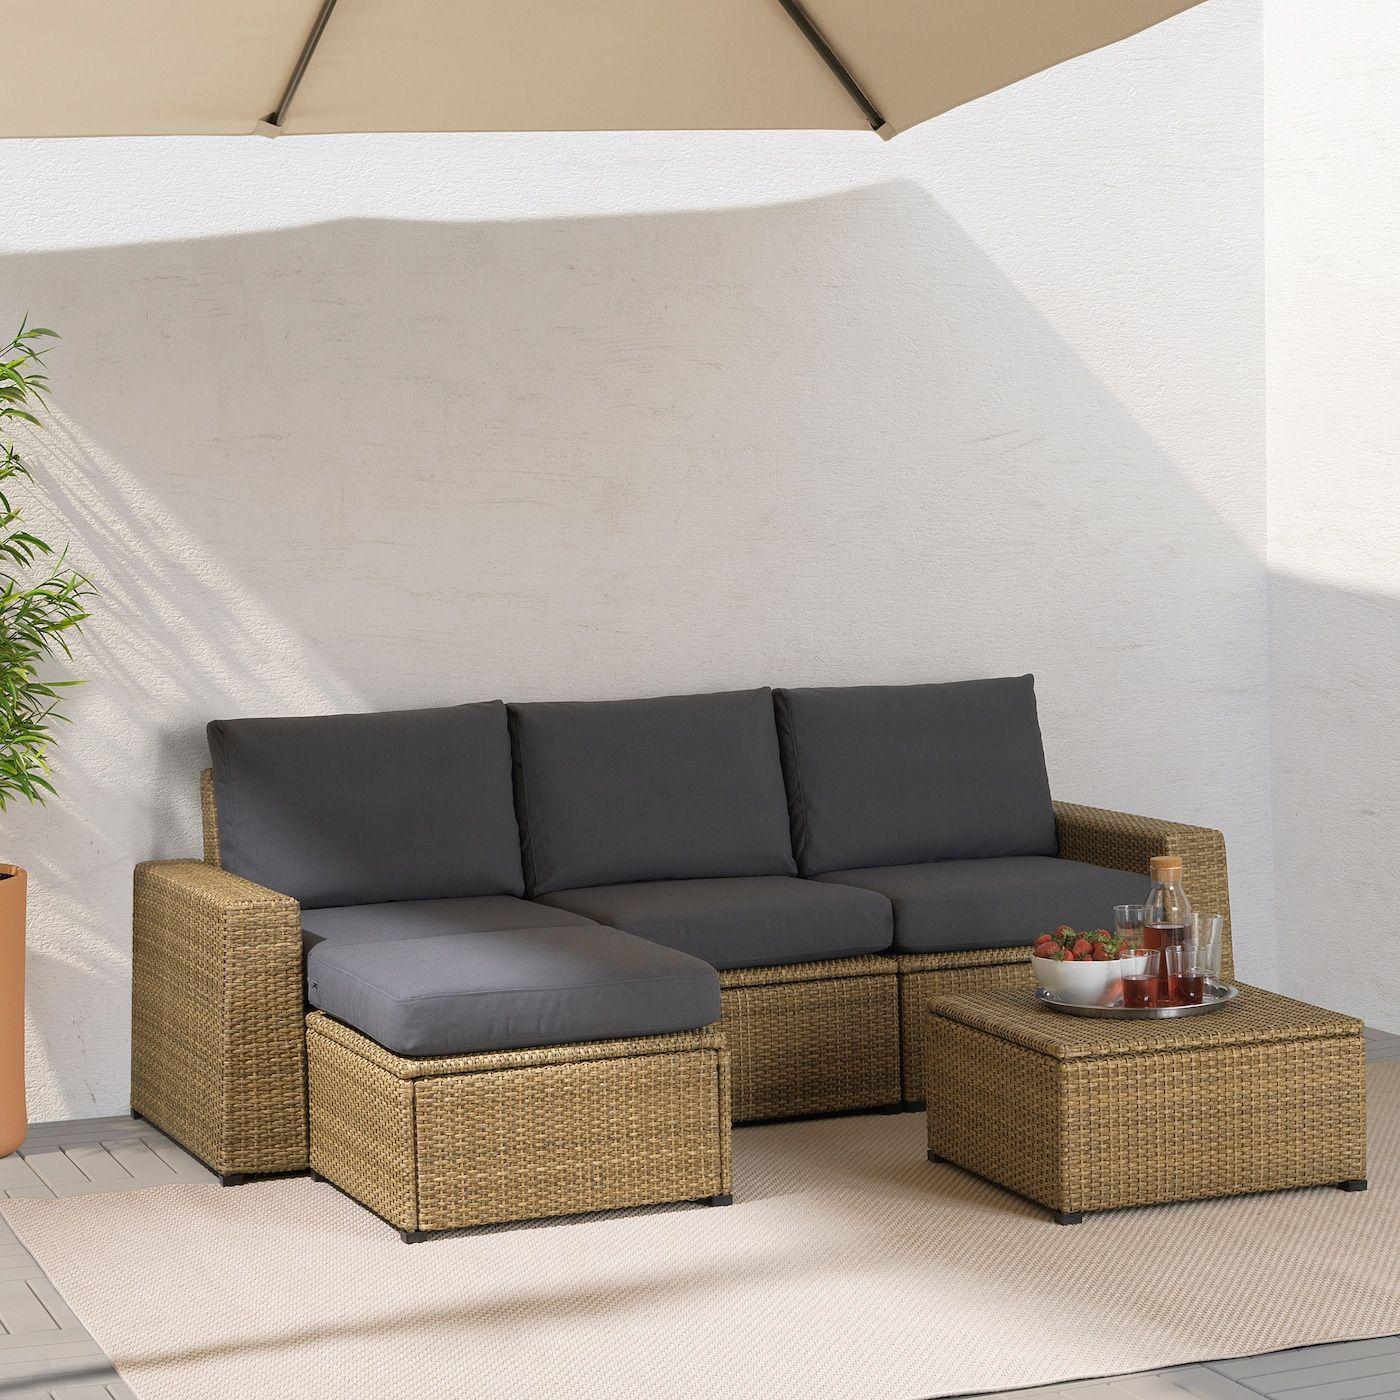 Solleron 3 Seat Modular Sofa Outdoor With Footstool Brown Froson Duvholmen Dark Gray Ikea In 2020 Modular Sofa Sofa Storage Outdoor Stools